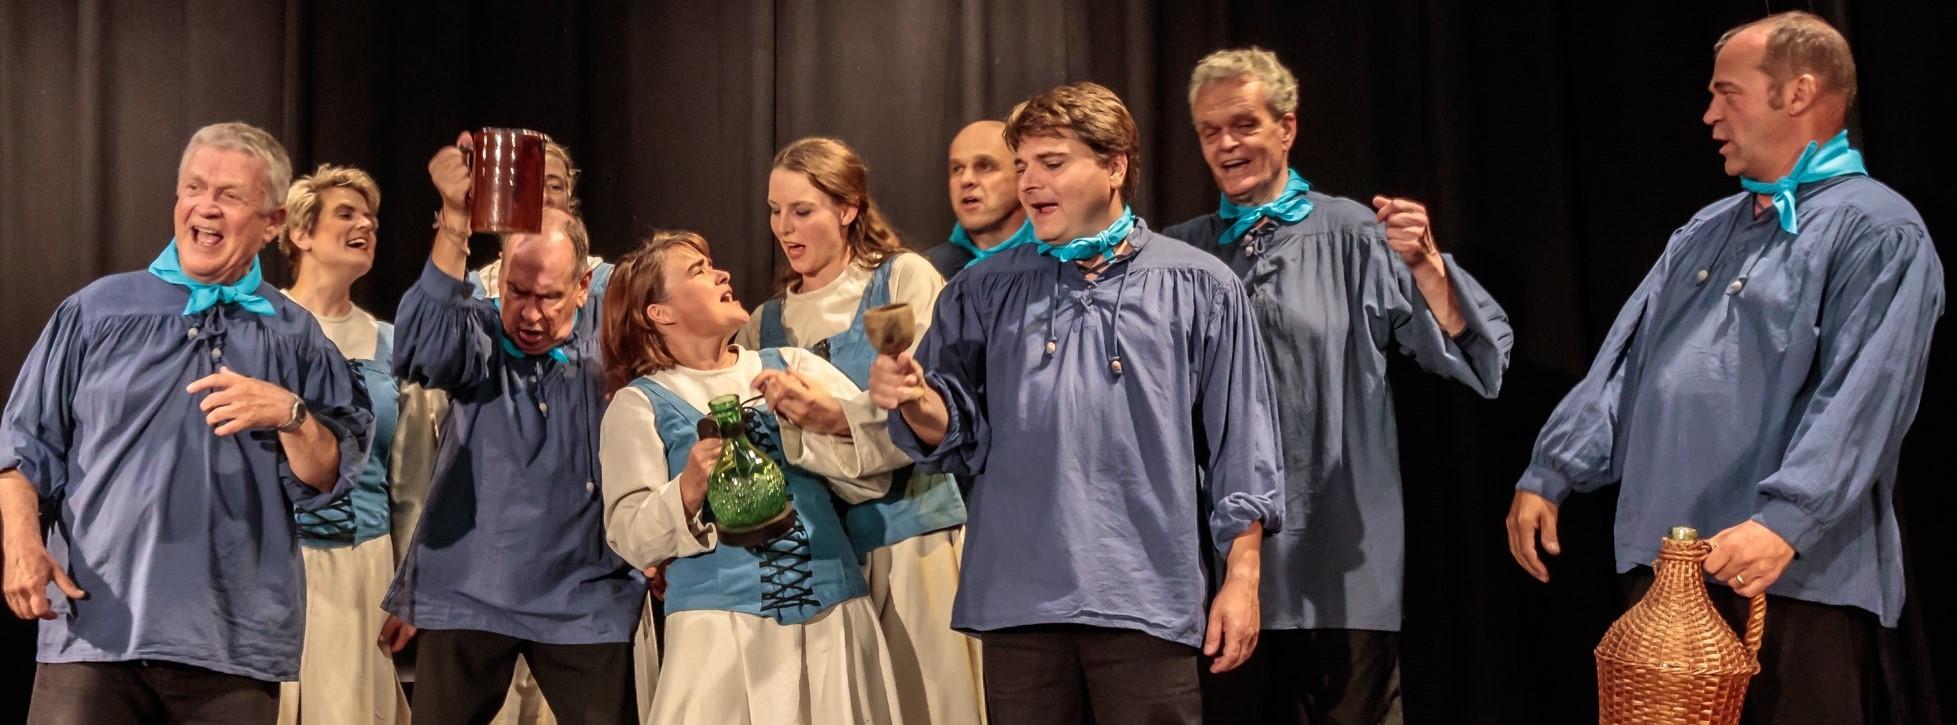 Verdi-Wagner-Gala - Steuermannchor